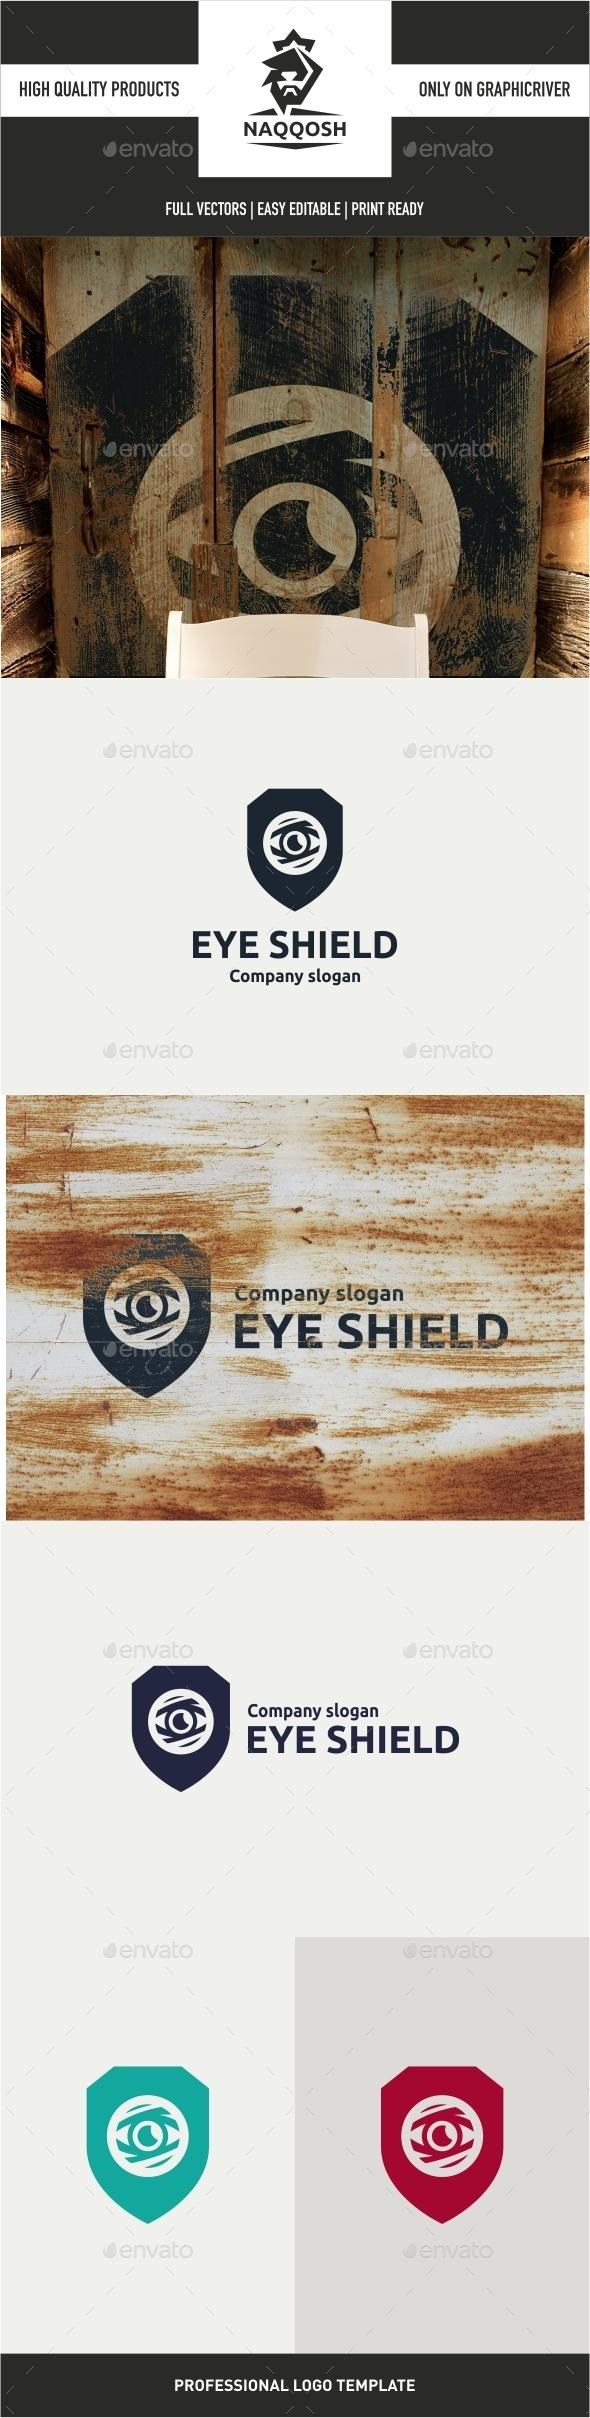 GraphicRiver Eye Shield 10918658